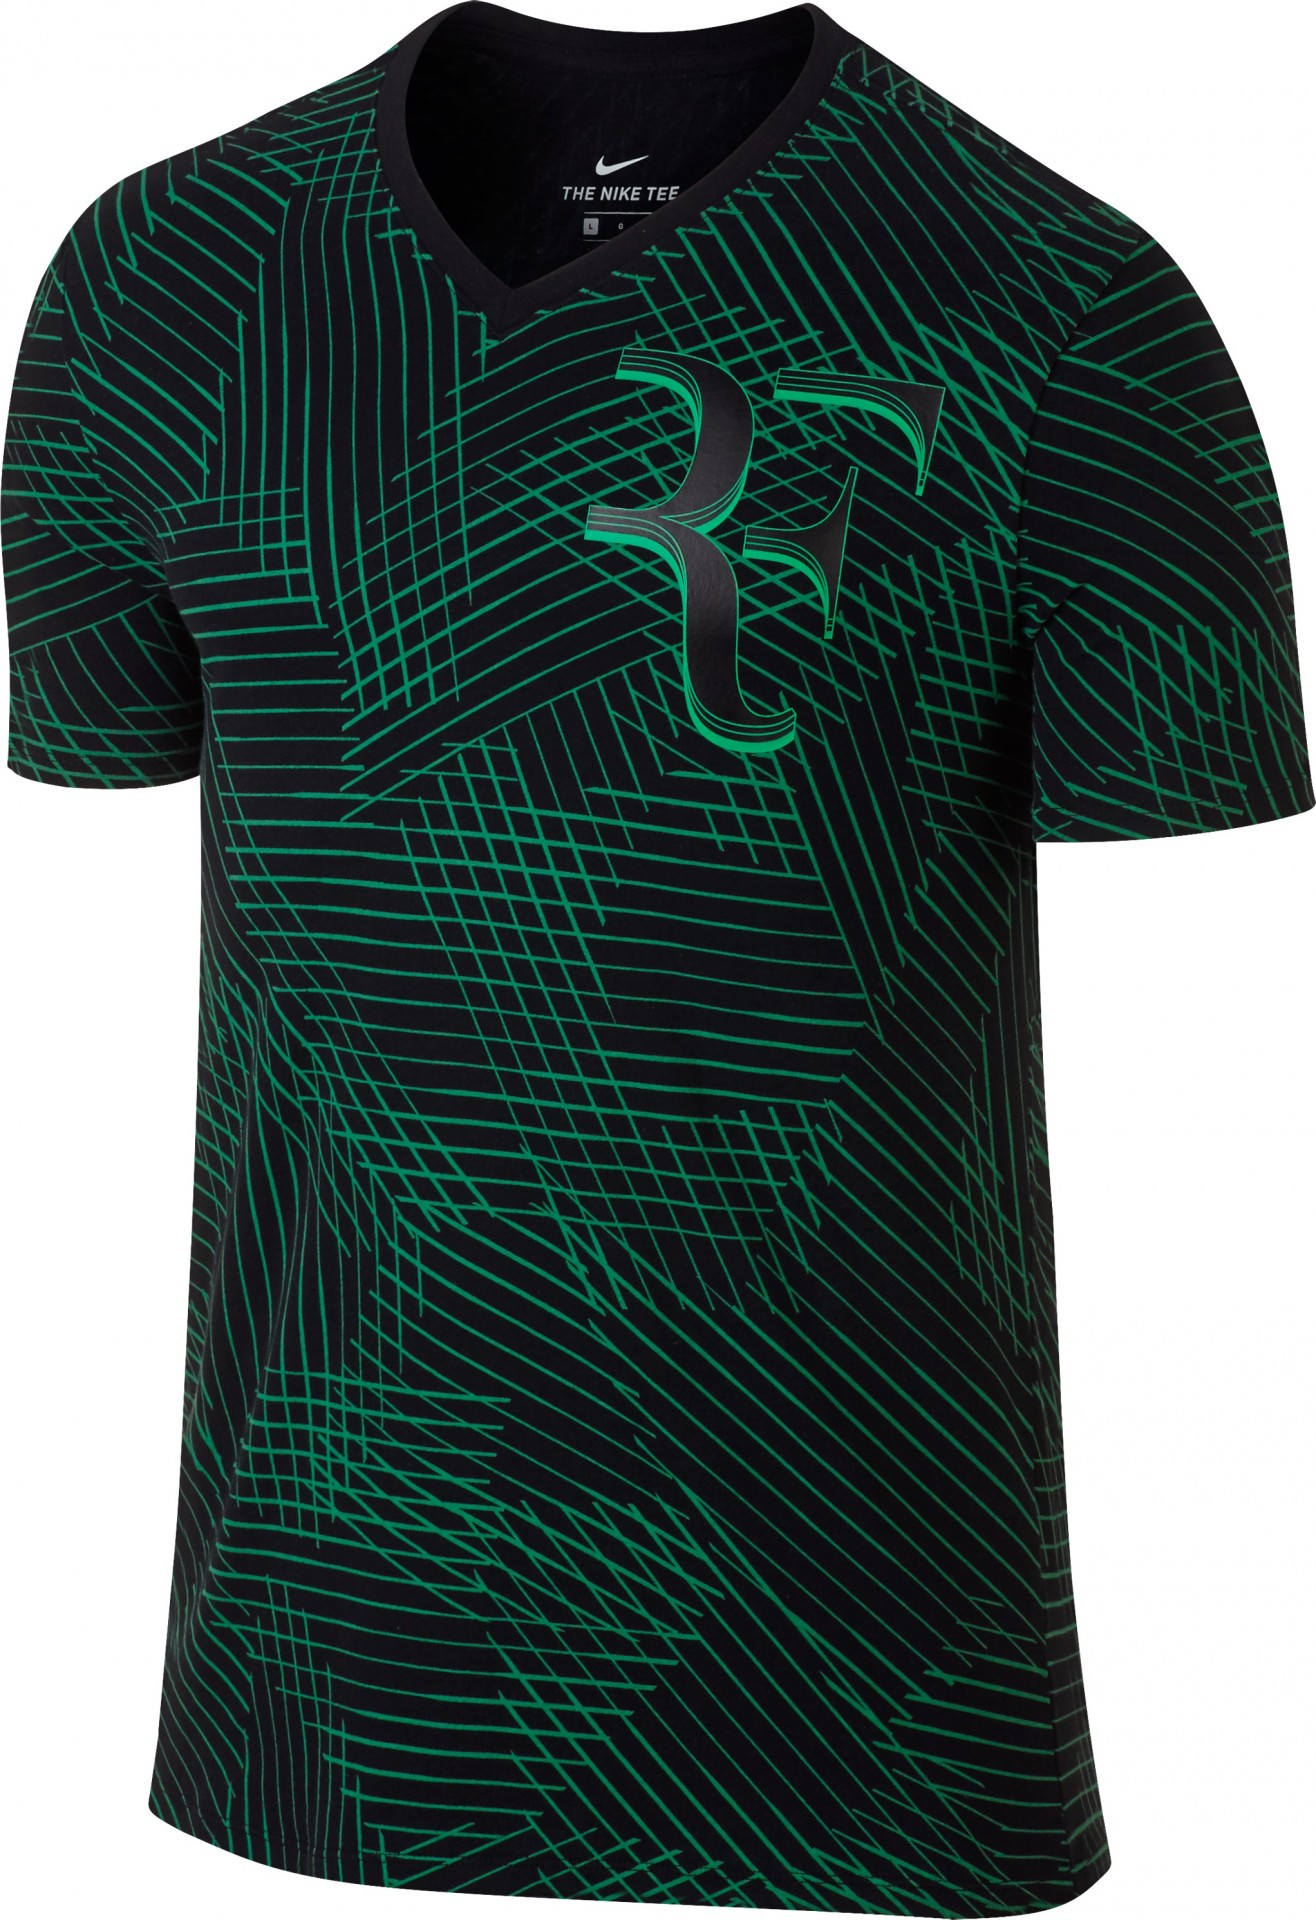 2d0e6abd02fb Tenisové tričko Nike Court Roger Federer 831466-010 černo-zelené